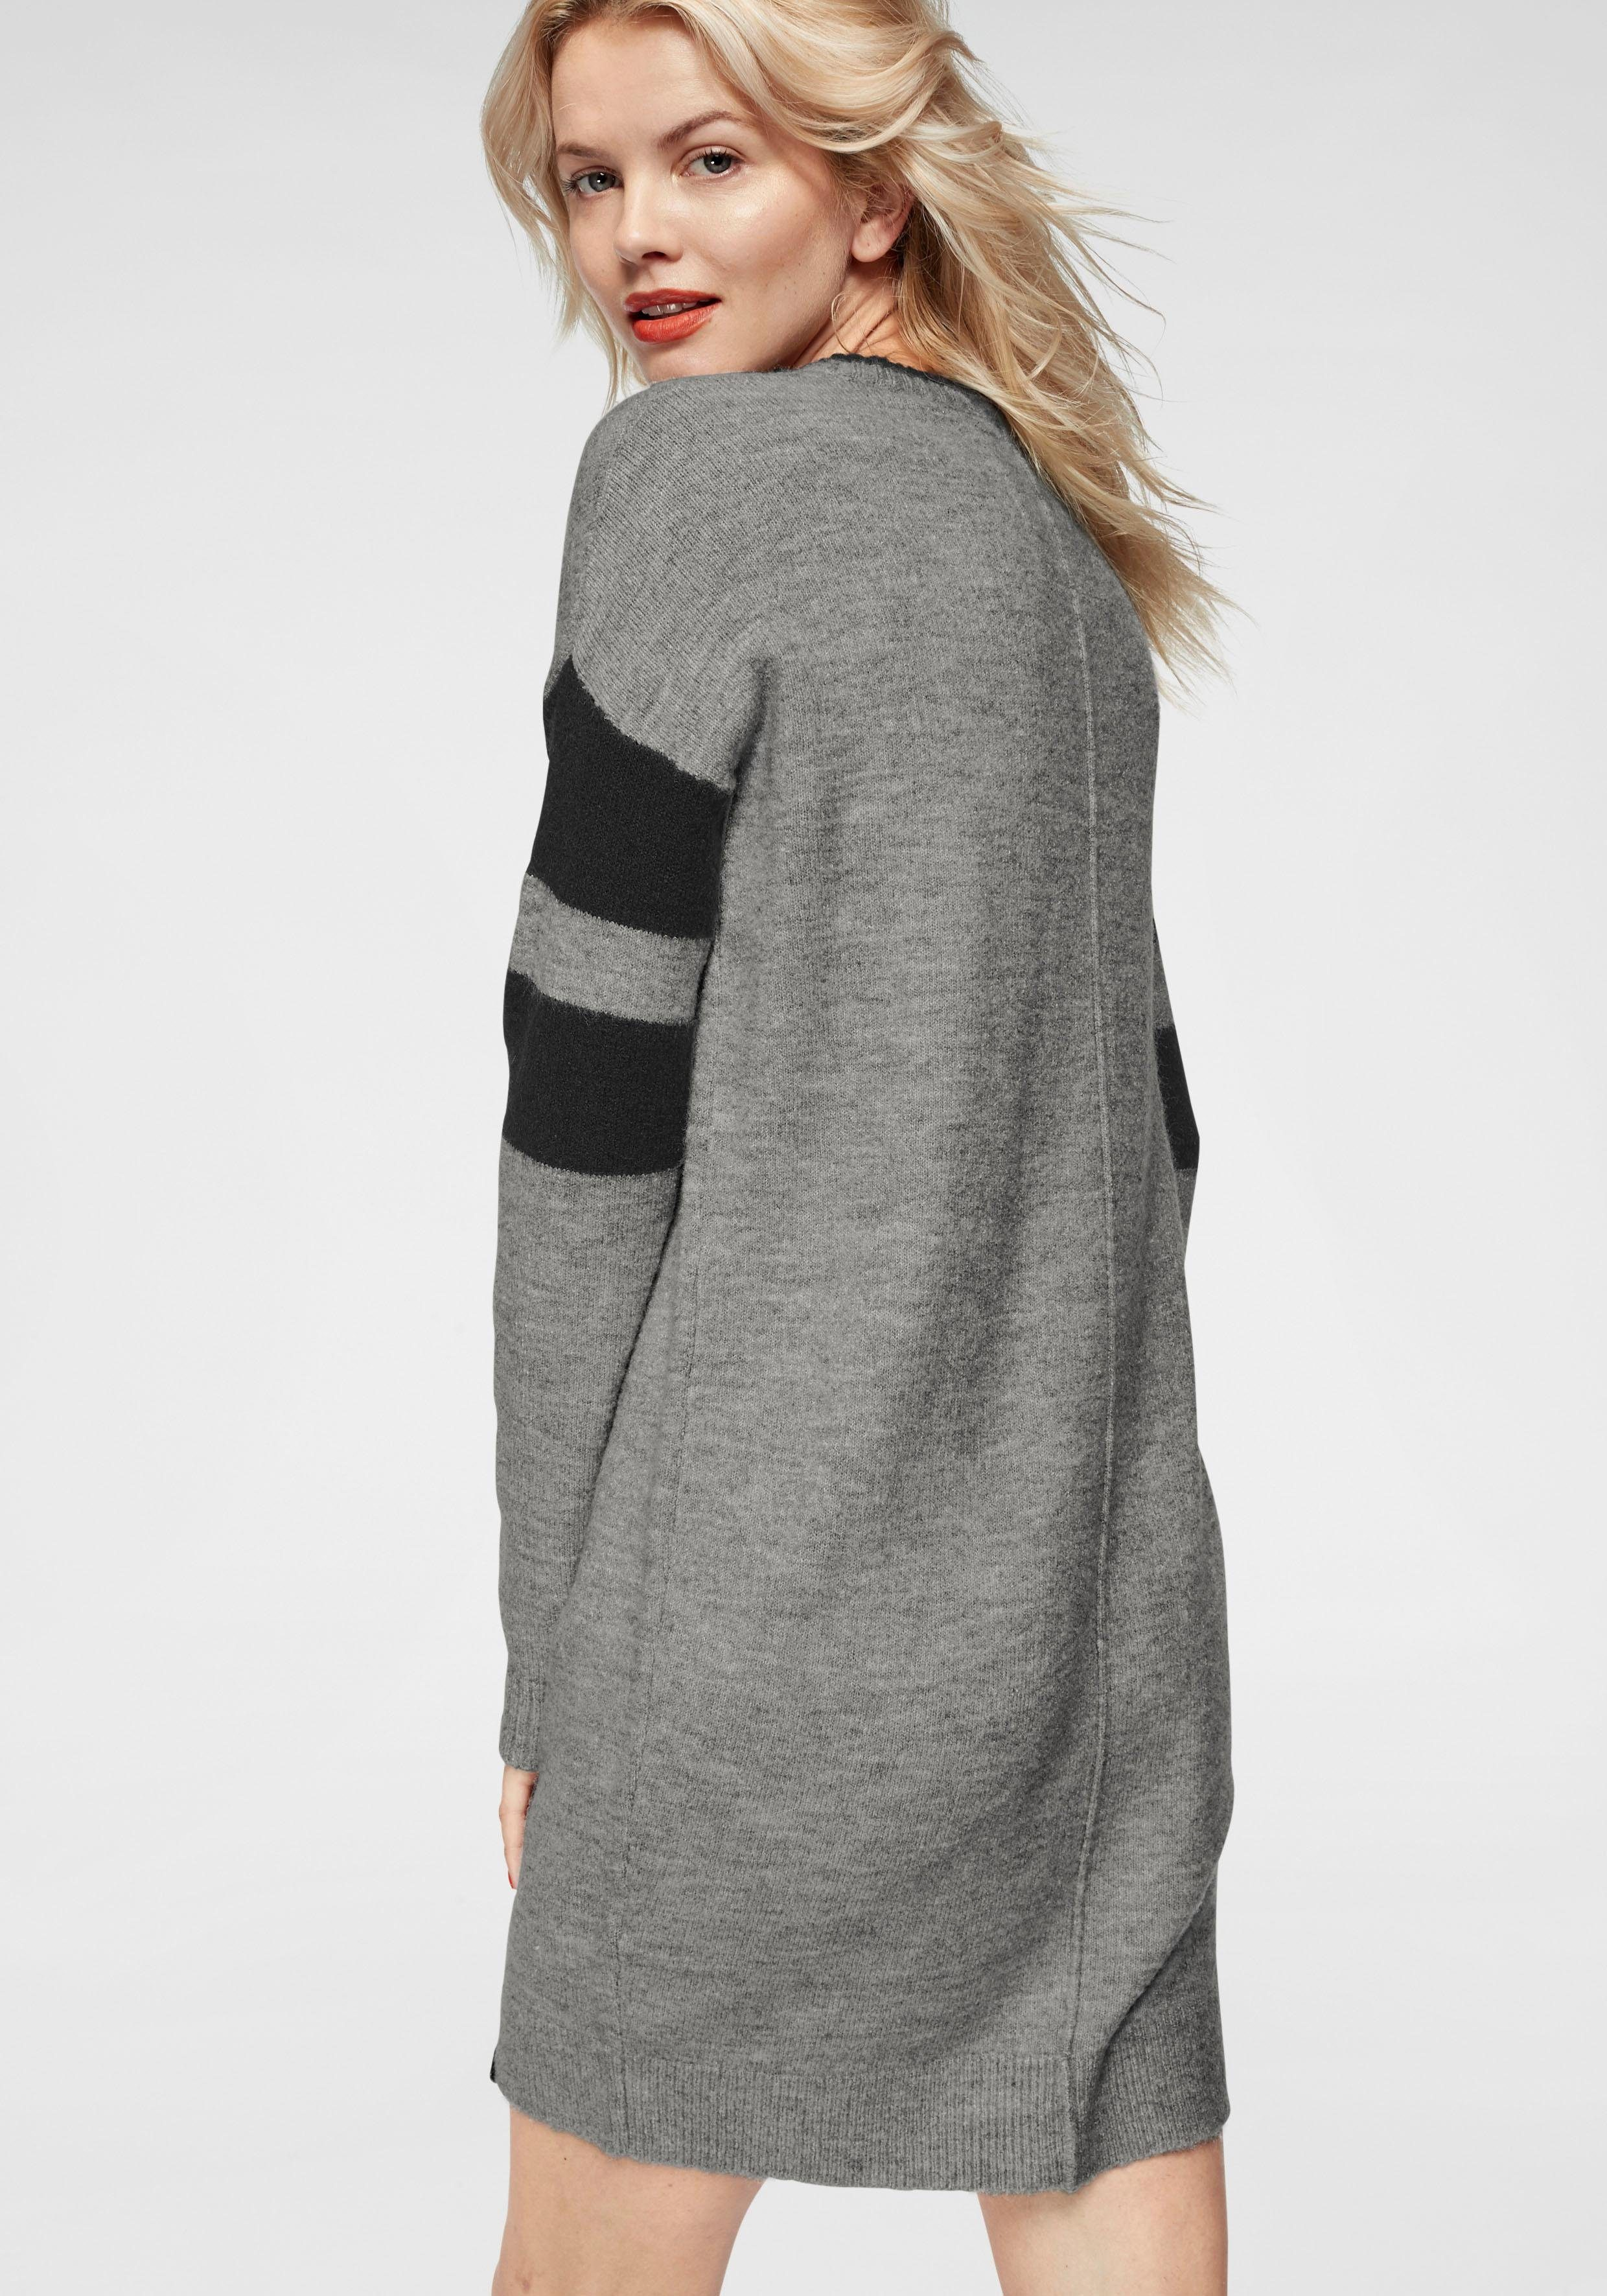 Makkelijk Superdry Sweater Besteld Knit Tricotjurk Dress« Otto »scandi TrFXqT